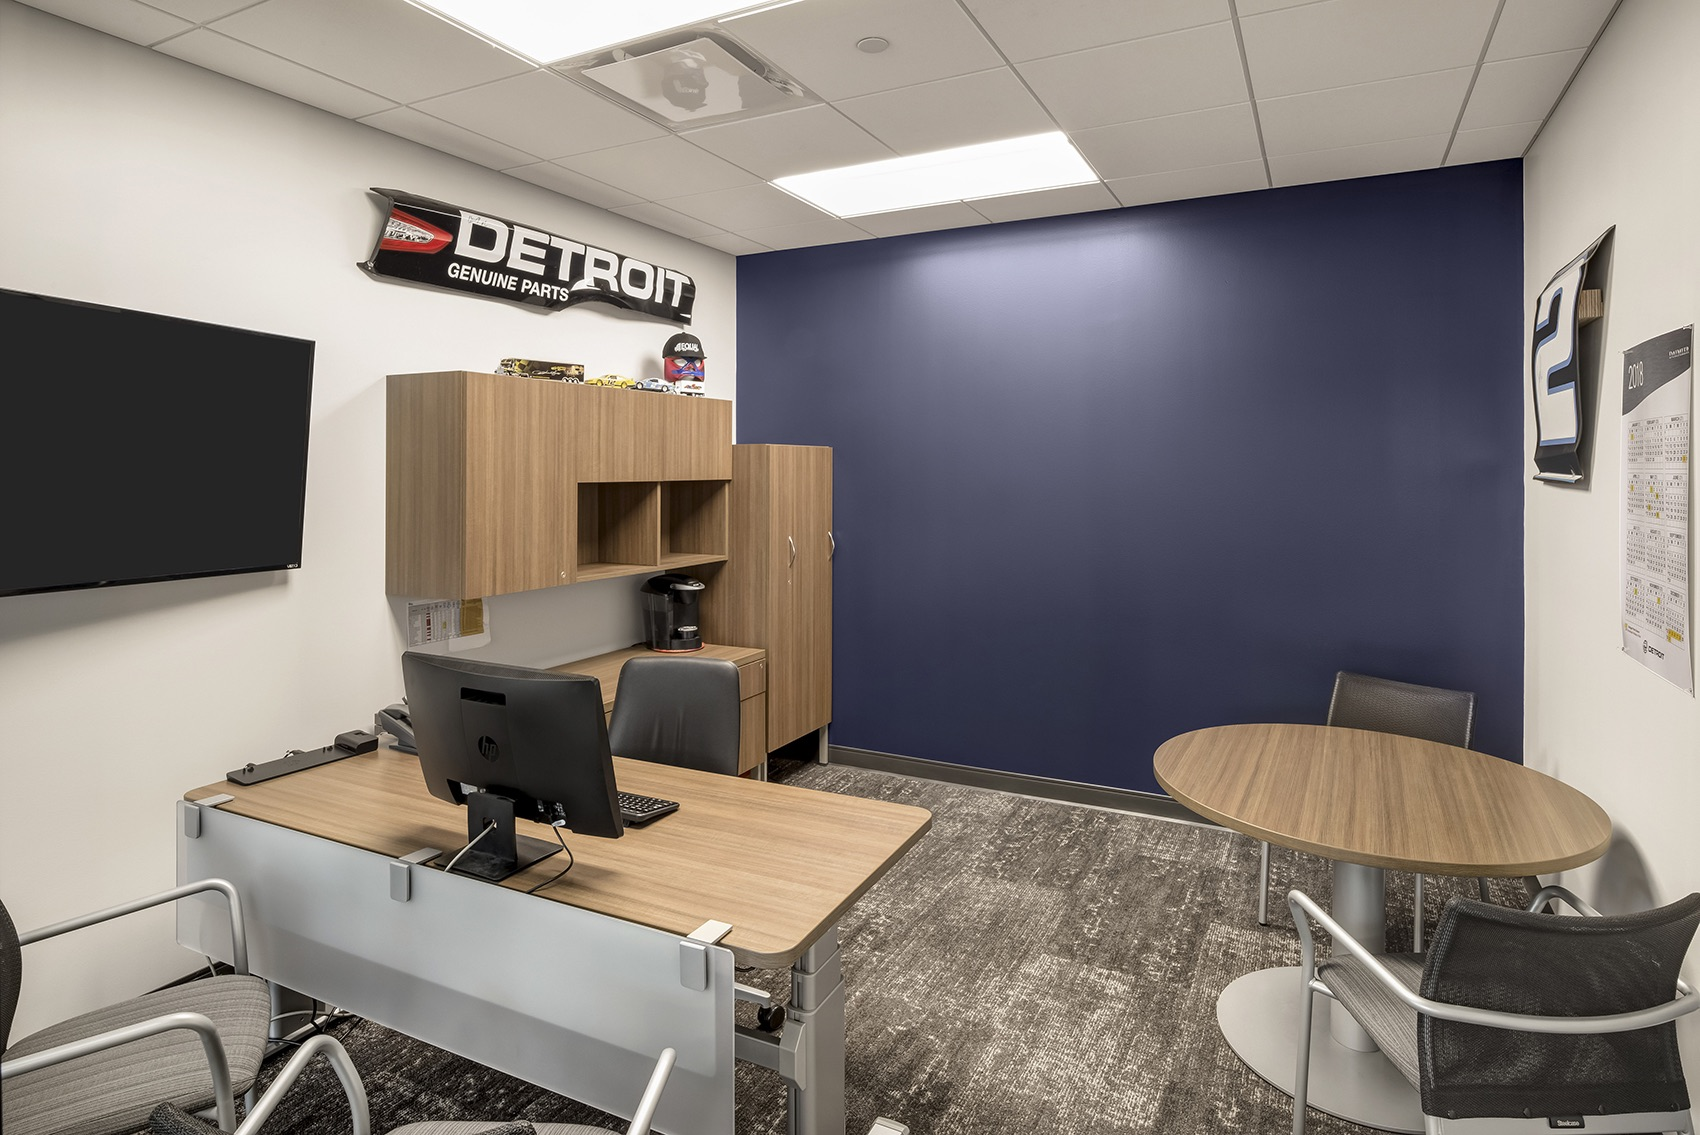 detroit-diesel-office-8